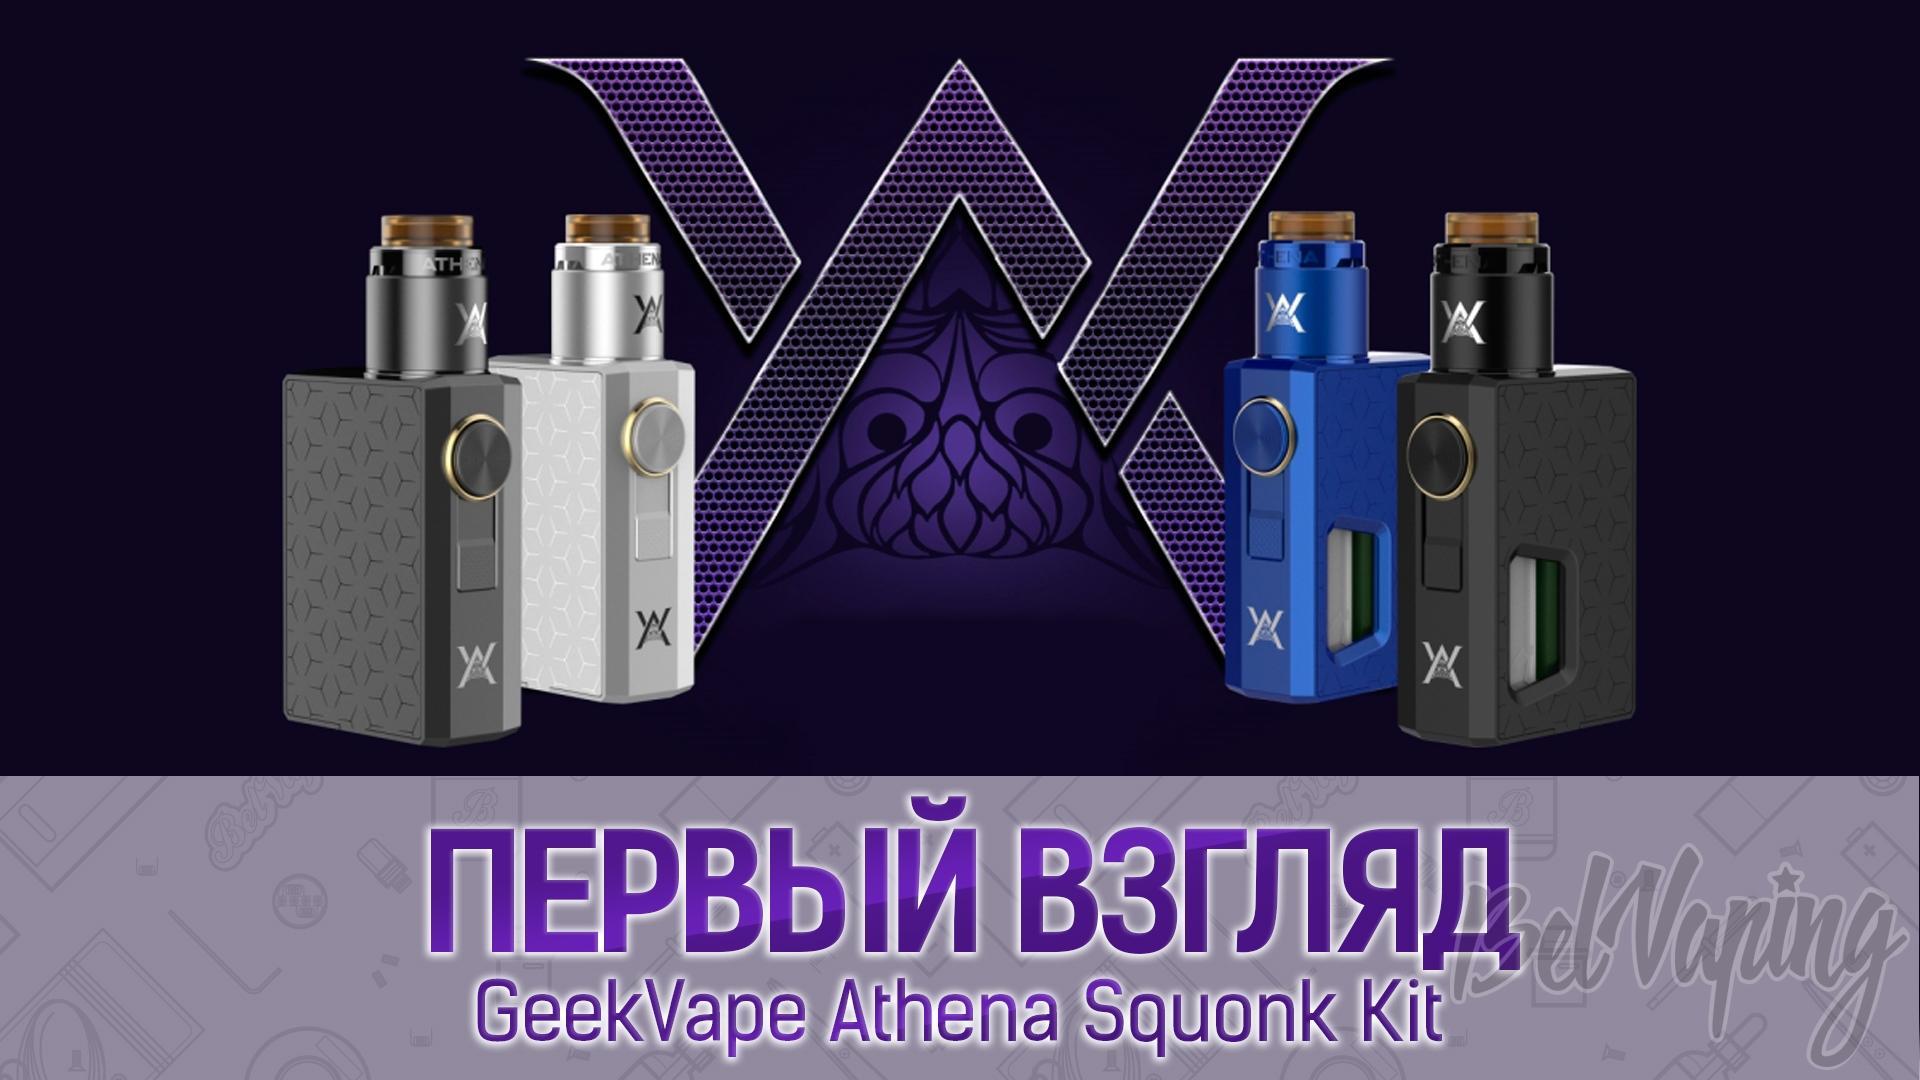 GeekVape Athena Squonk Kit. Первый взгляд